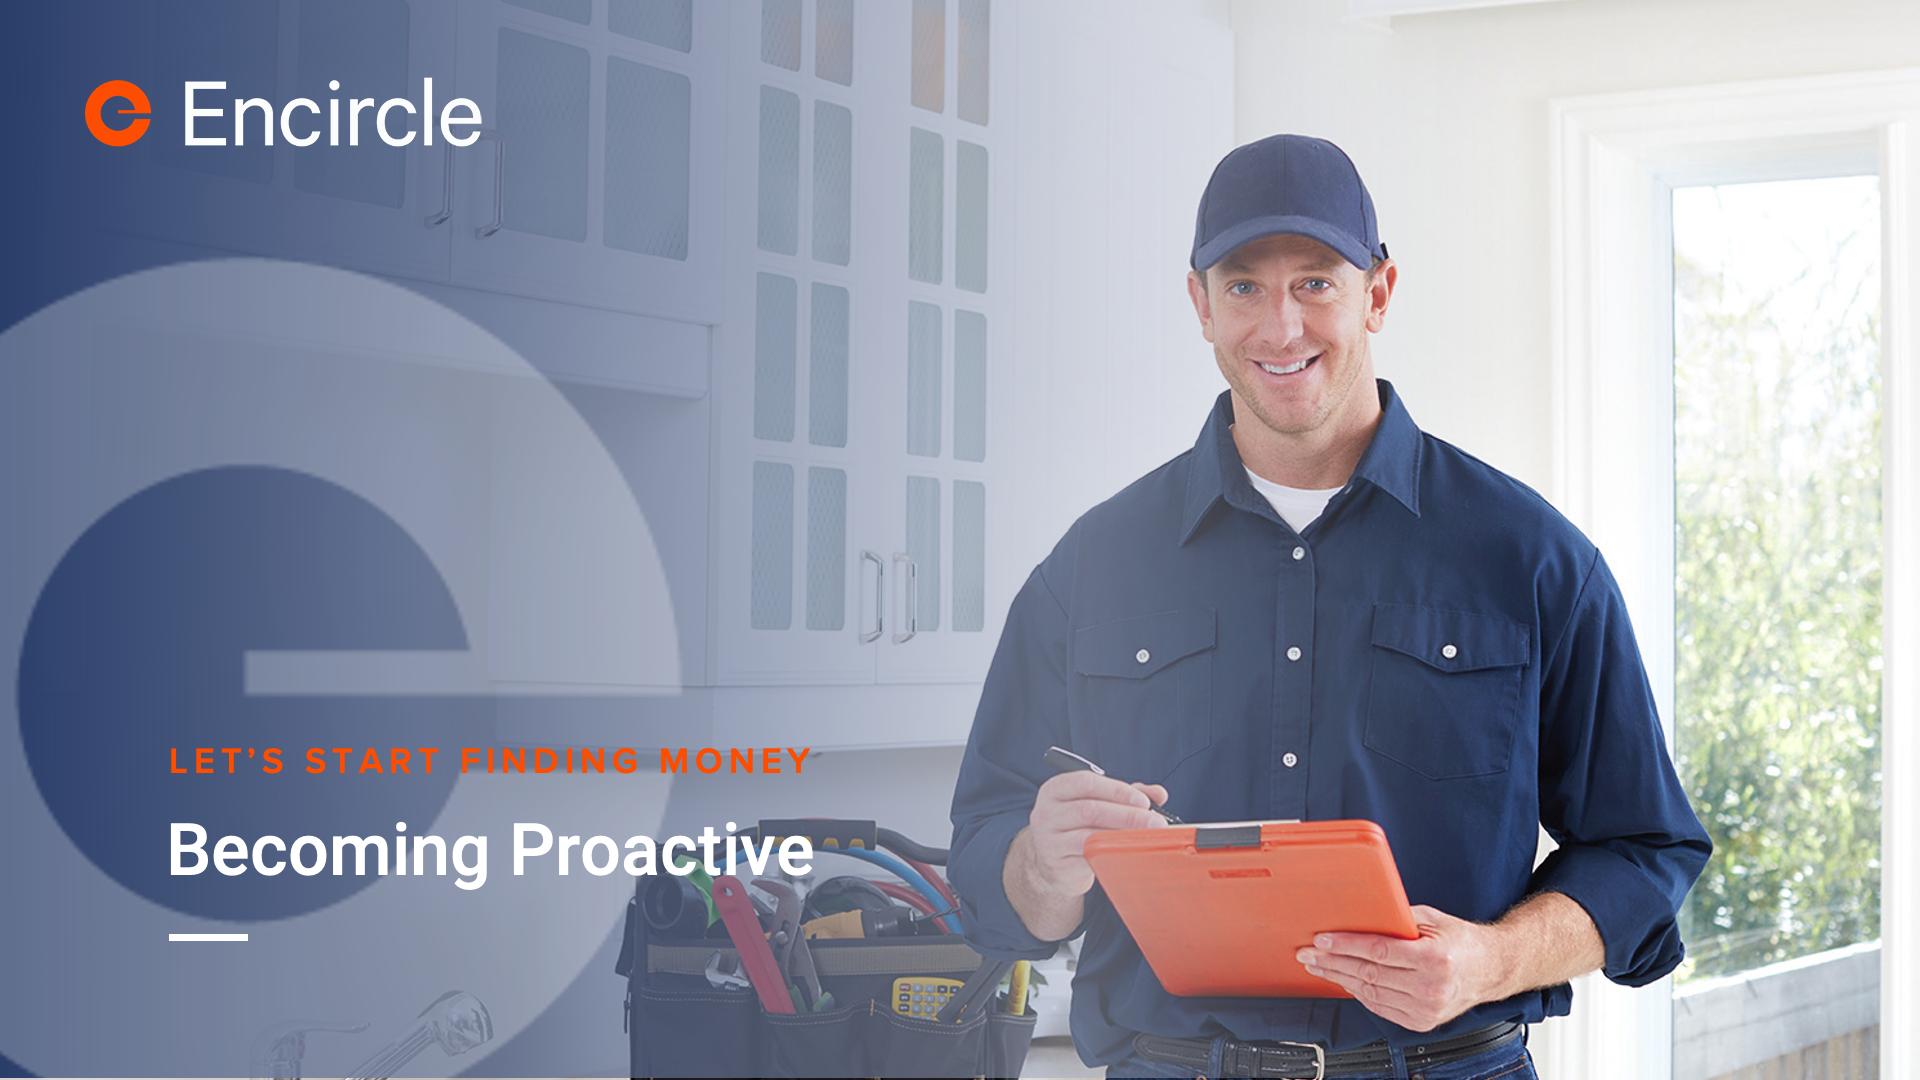 2-Becoming-Proactive-3-Tools-Workshop